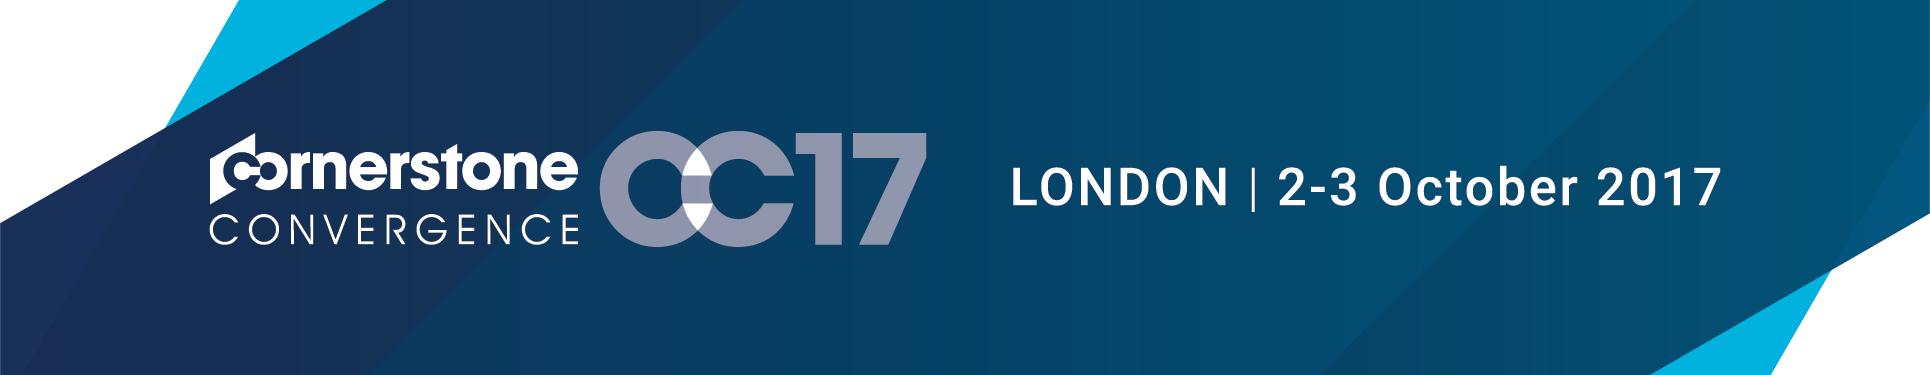 Convergence EMEA 2017